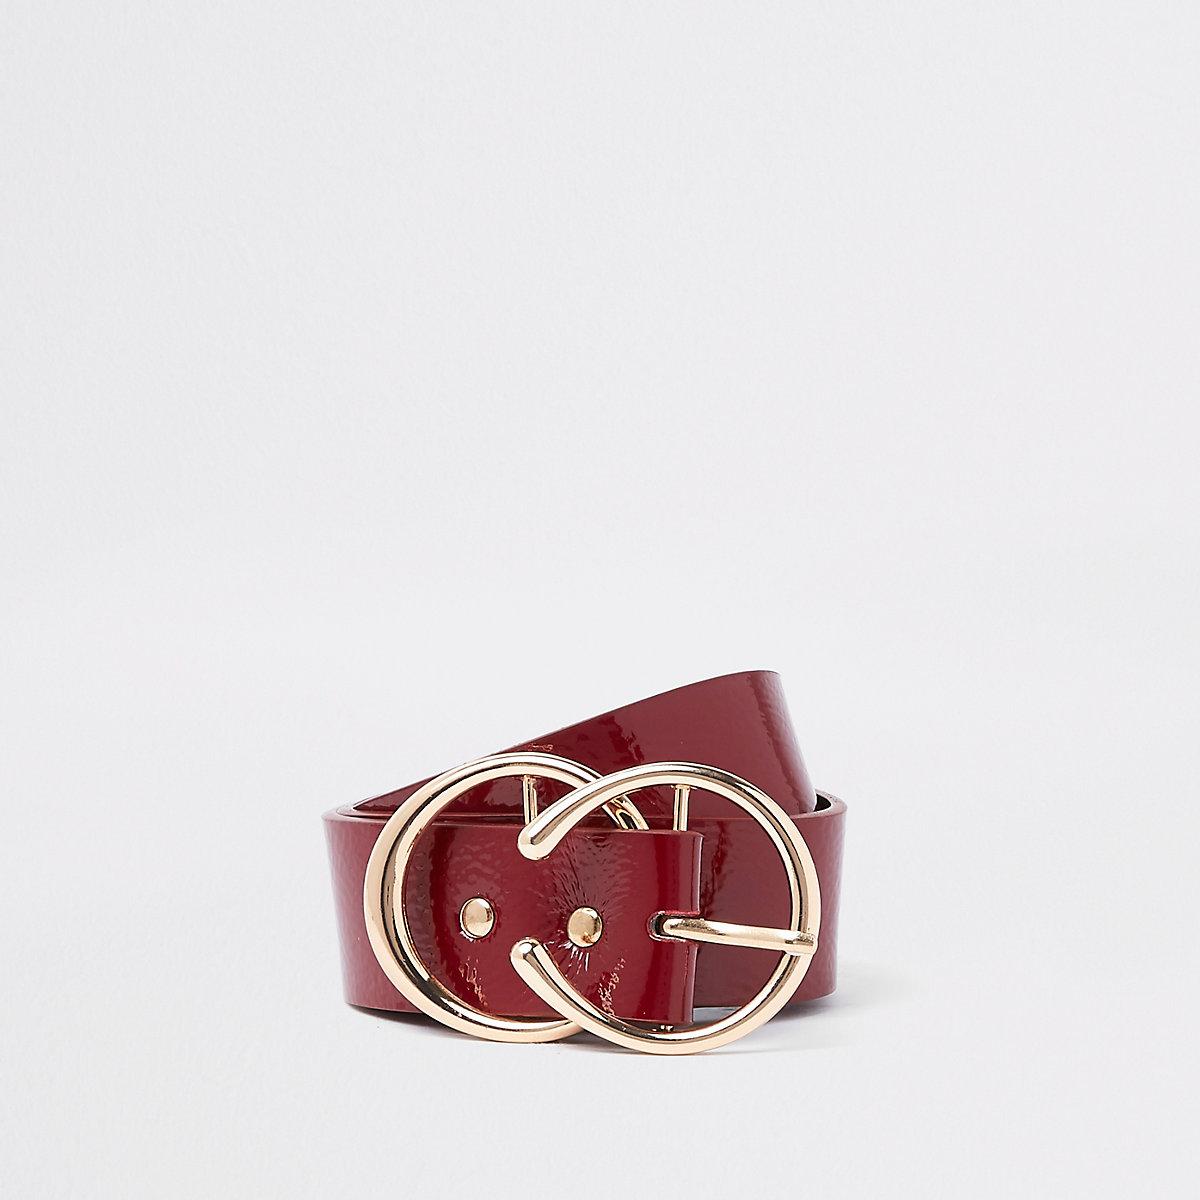 Dark red horseshoe double ring belt